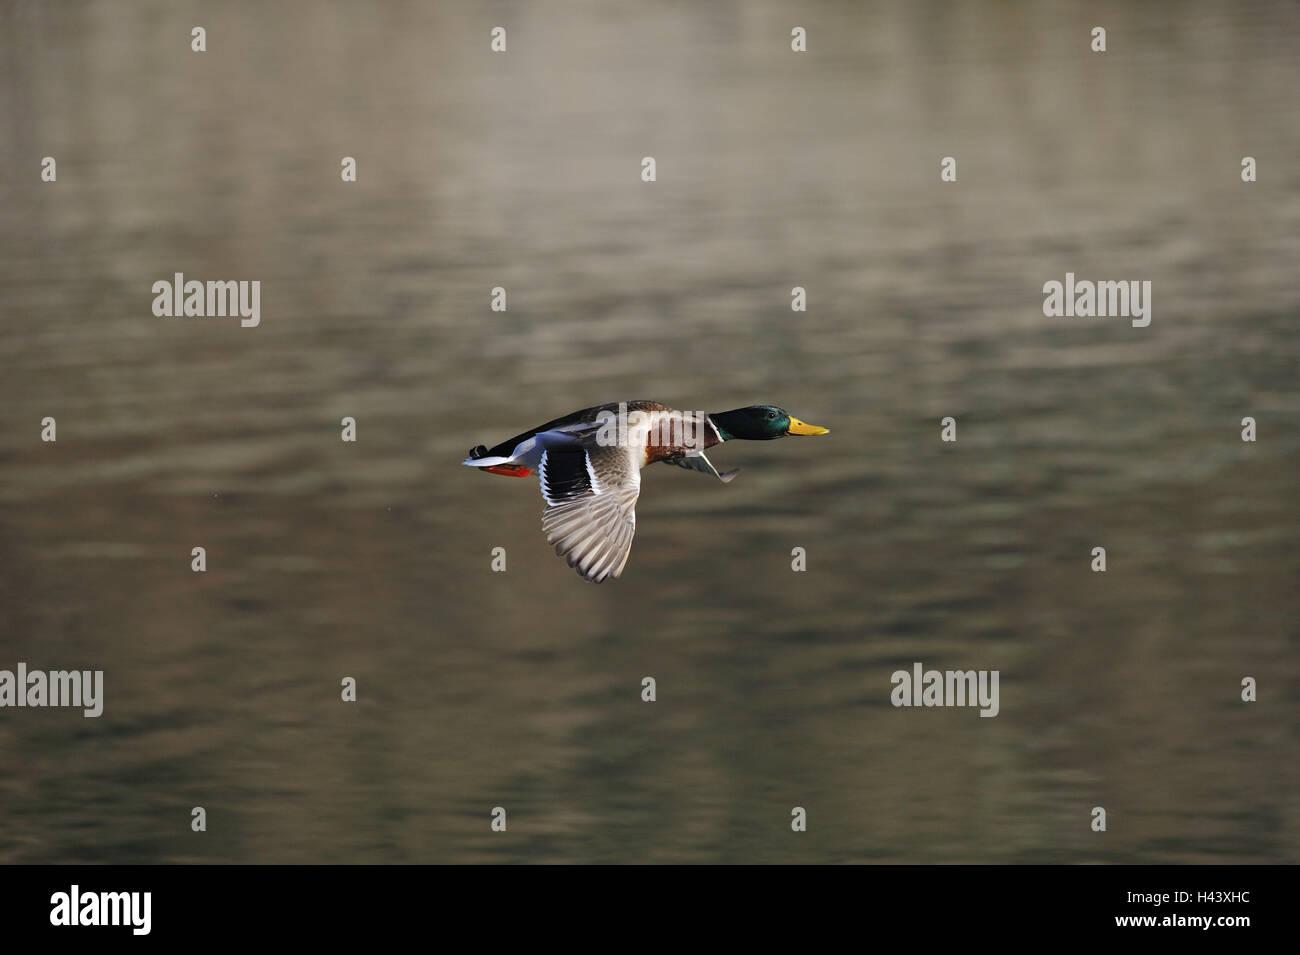 Lakes, mallard, Anas platyrhynchos, male, fly, swim waters, drake, goose's birds, duck, wild duck, swimming - Stock Image